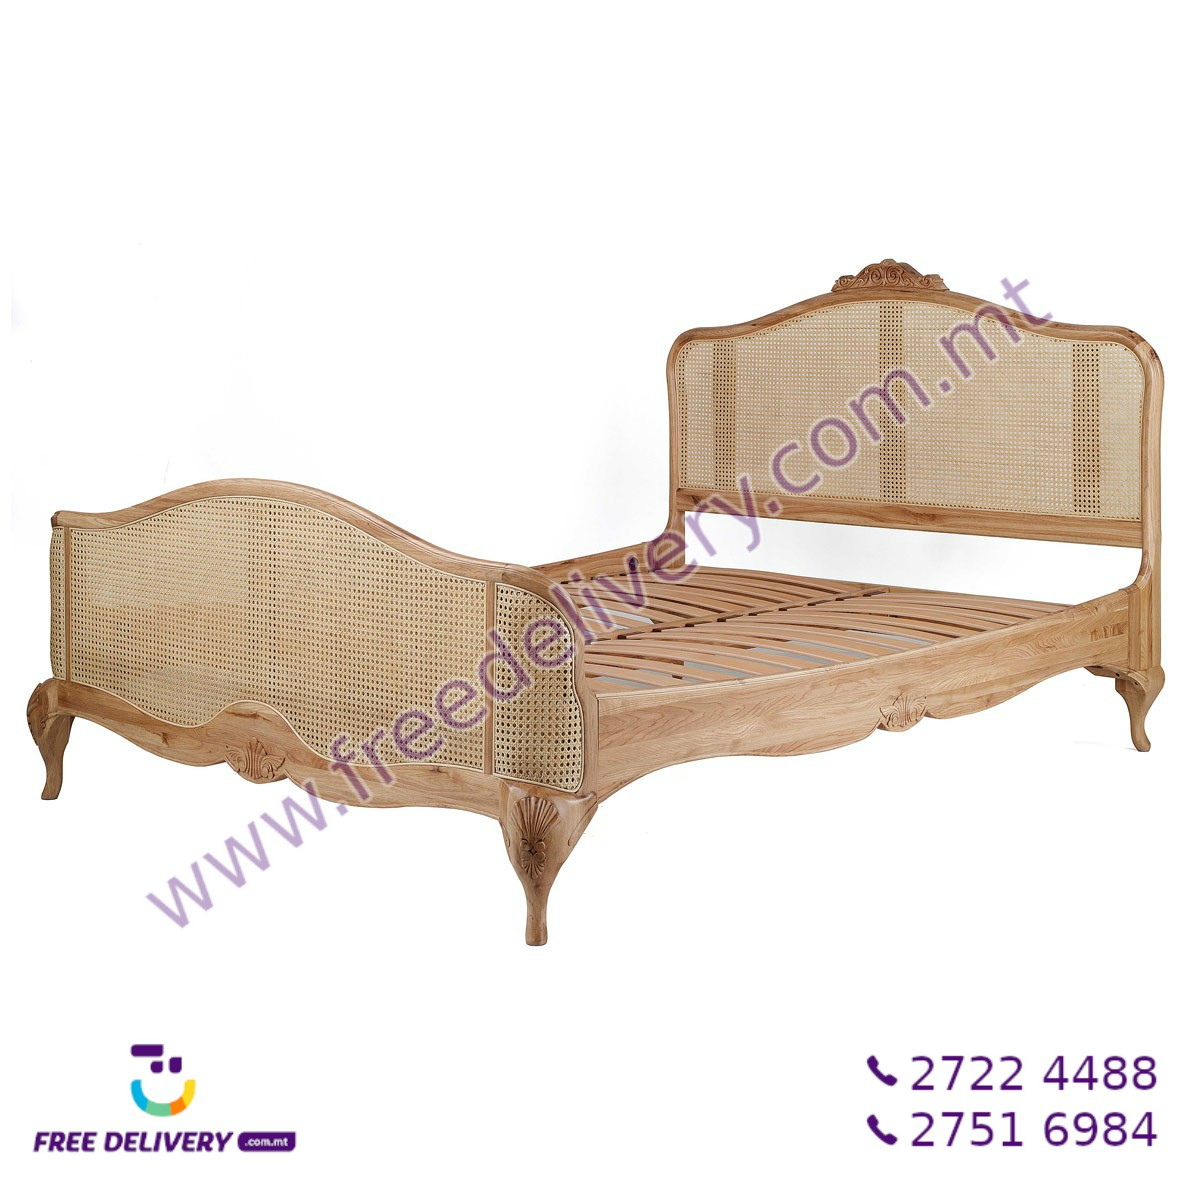 CHARLOTTE FRENCH DESIGN BED. DJ6